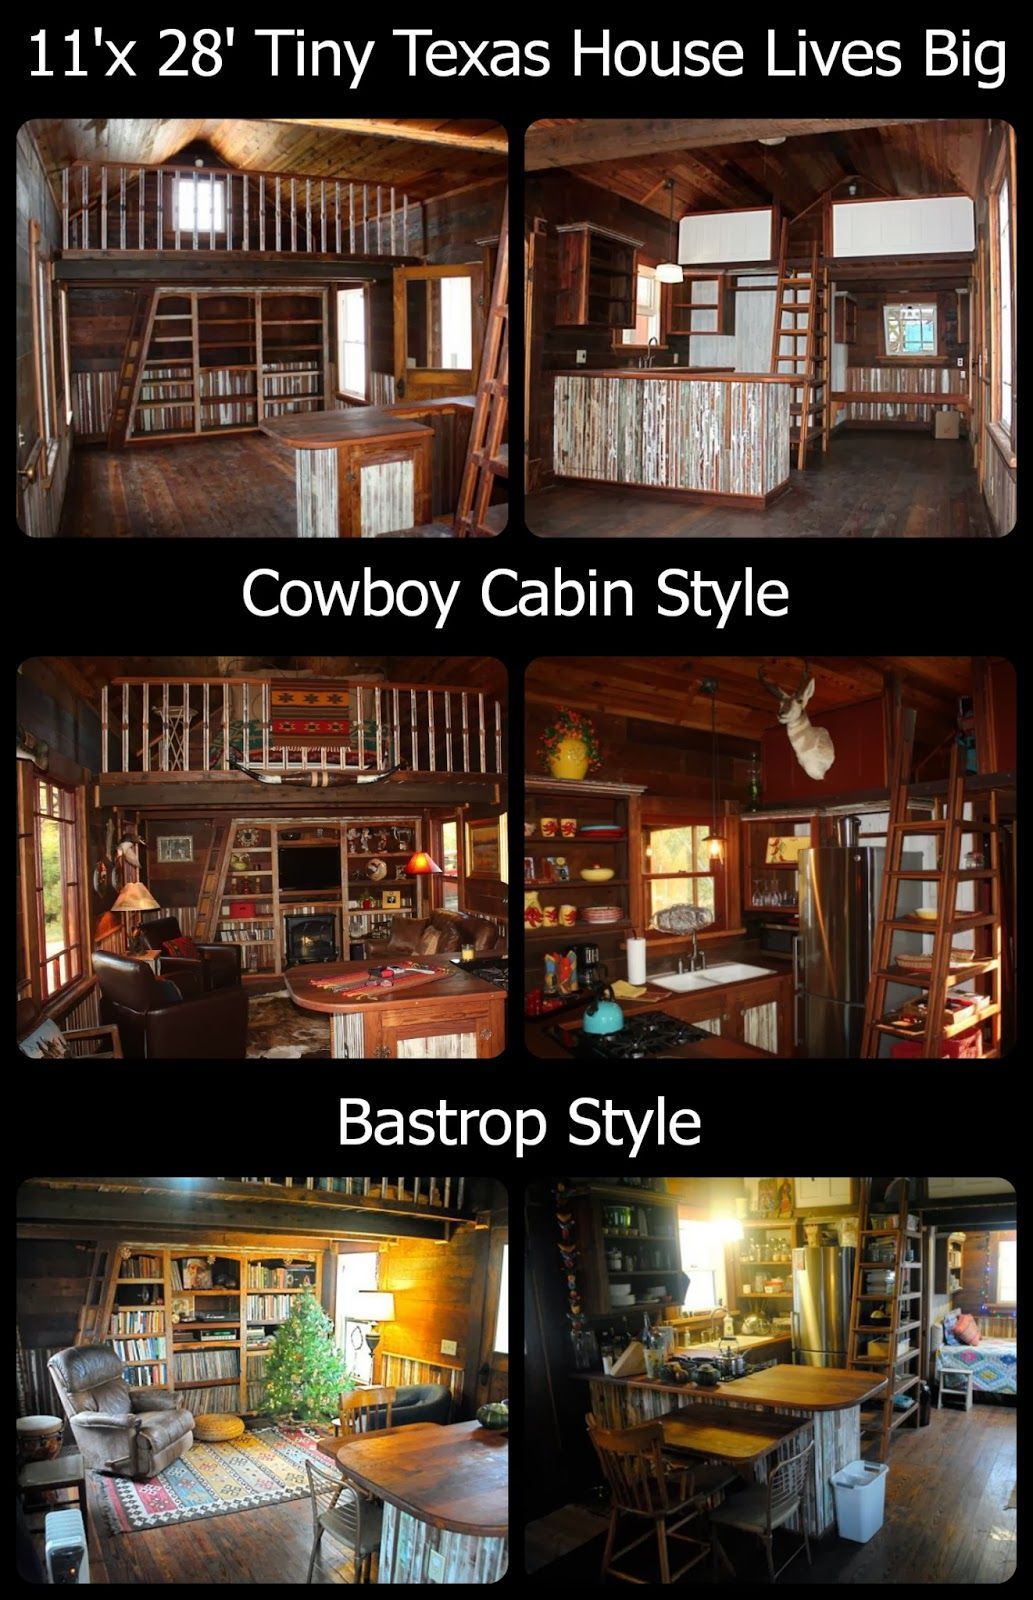 Sweatsville 12 x 28 Tiny Texas Houses Cowboy Cabin view of it – Tiny Texas Houses Floor Plans